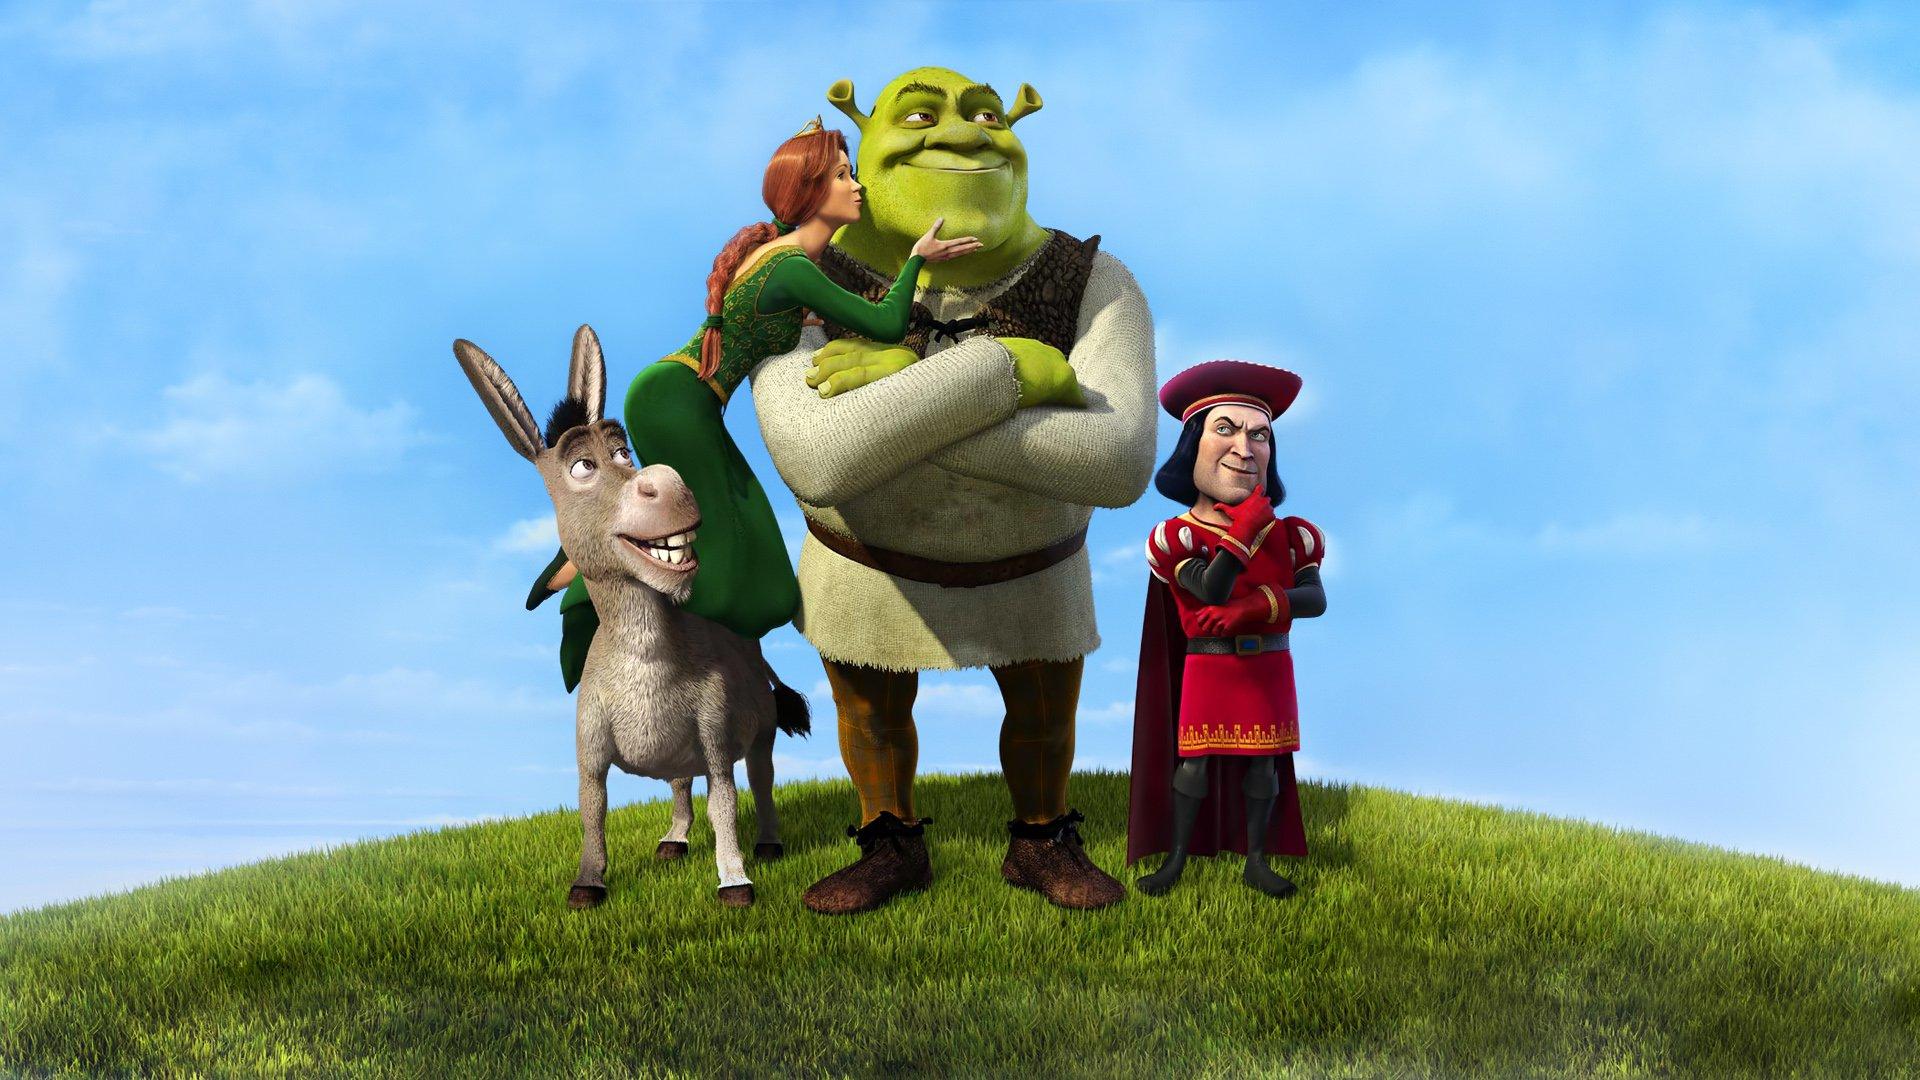 Shrek Full HD Wallpaper and Background | 1920x1080 | ID:679879